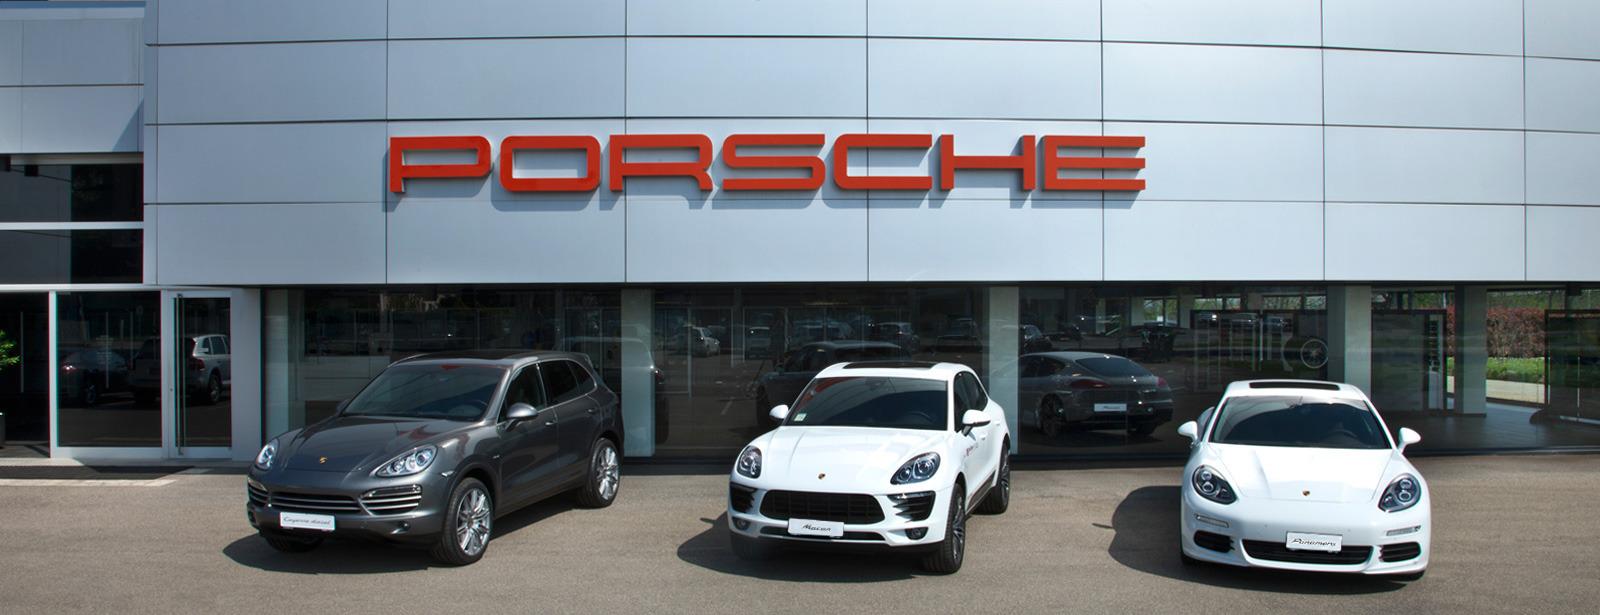 Centro Porsche Alessandria